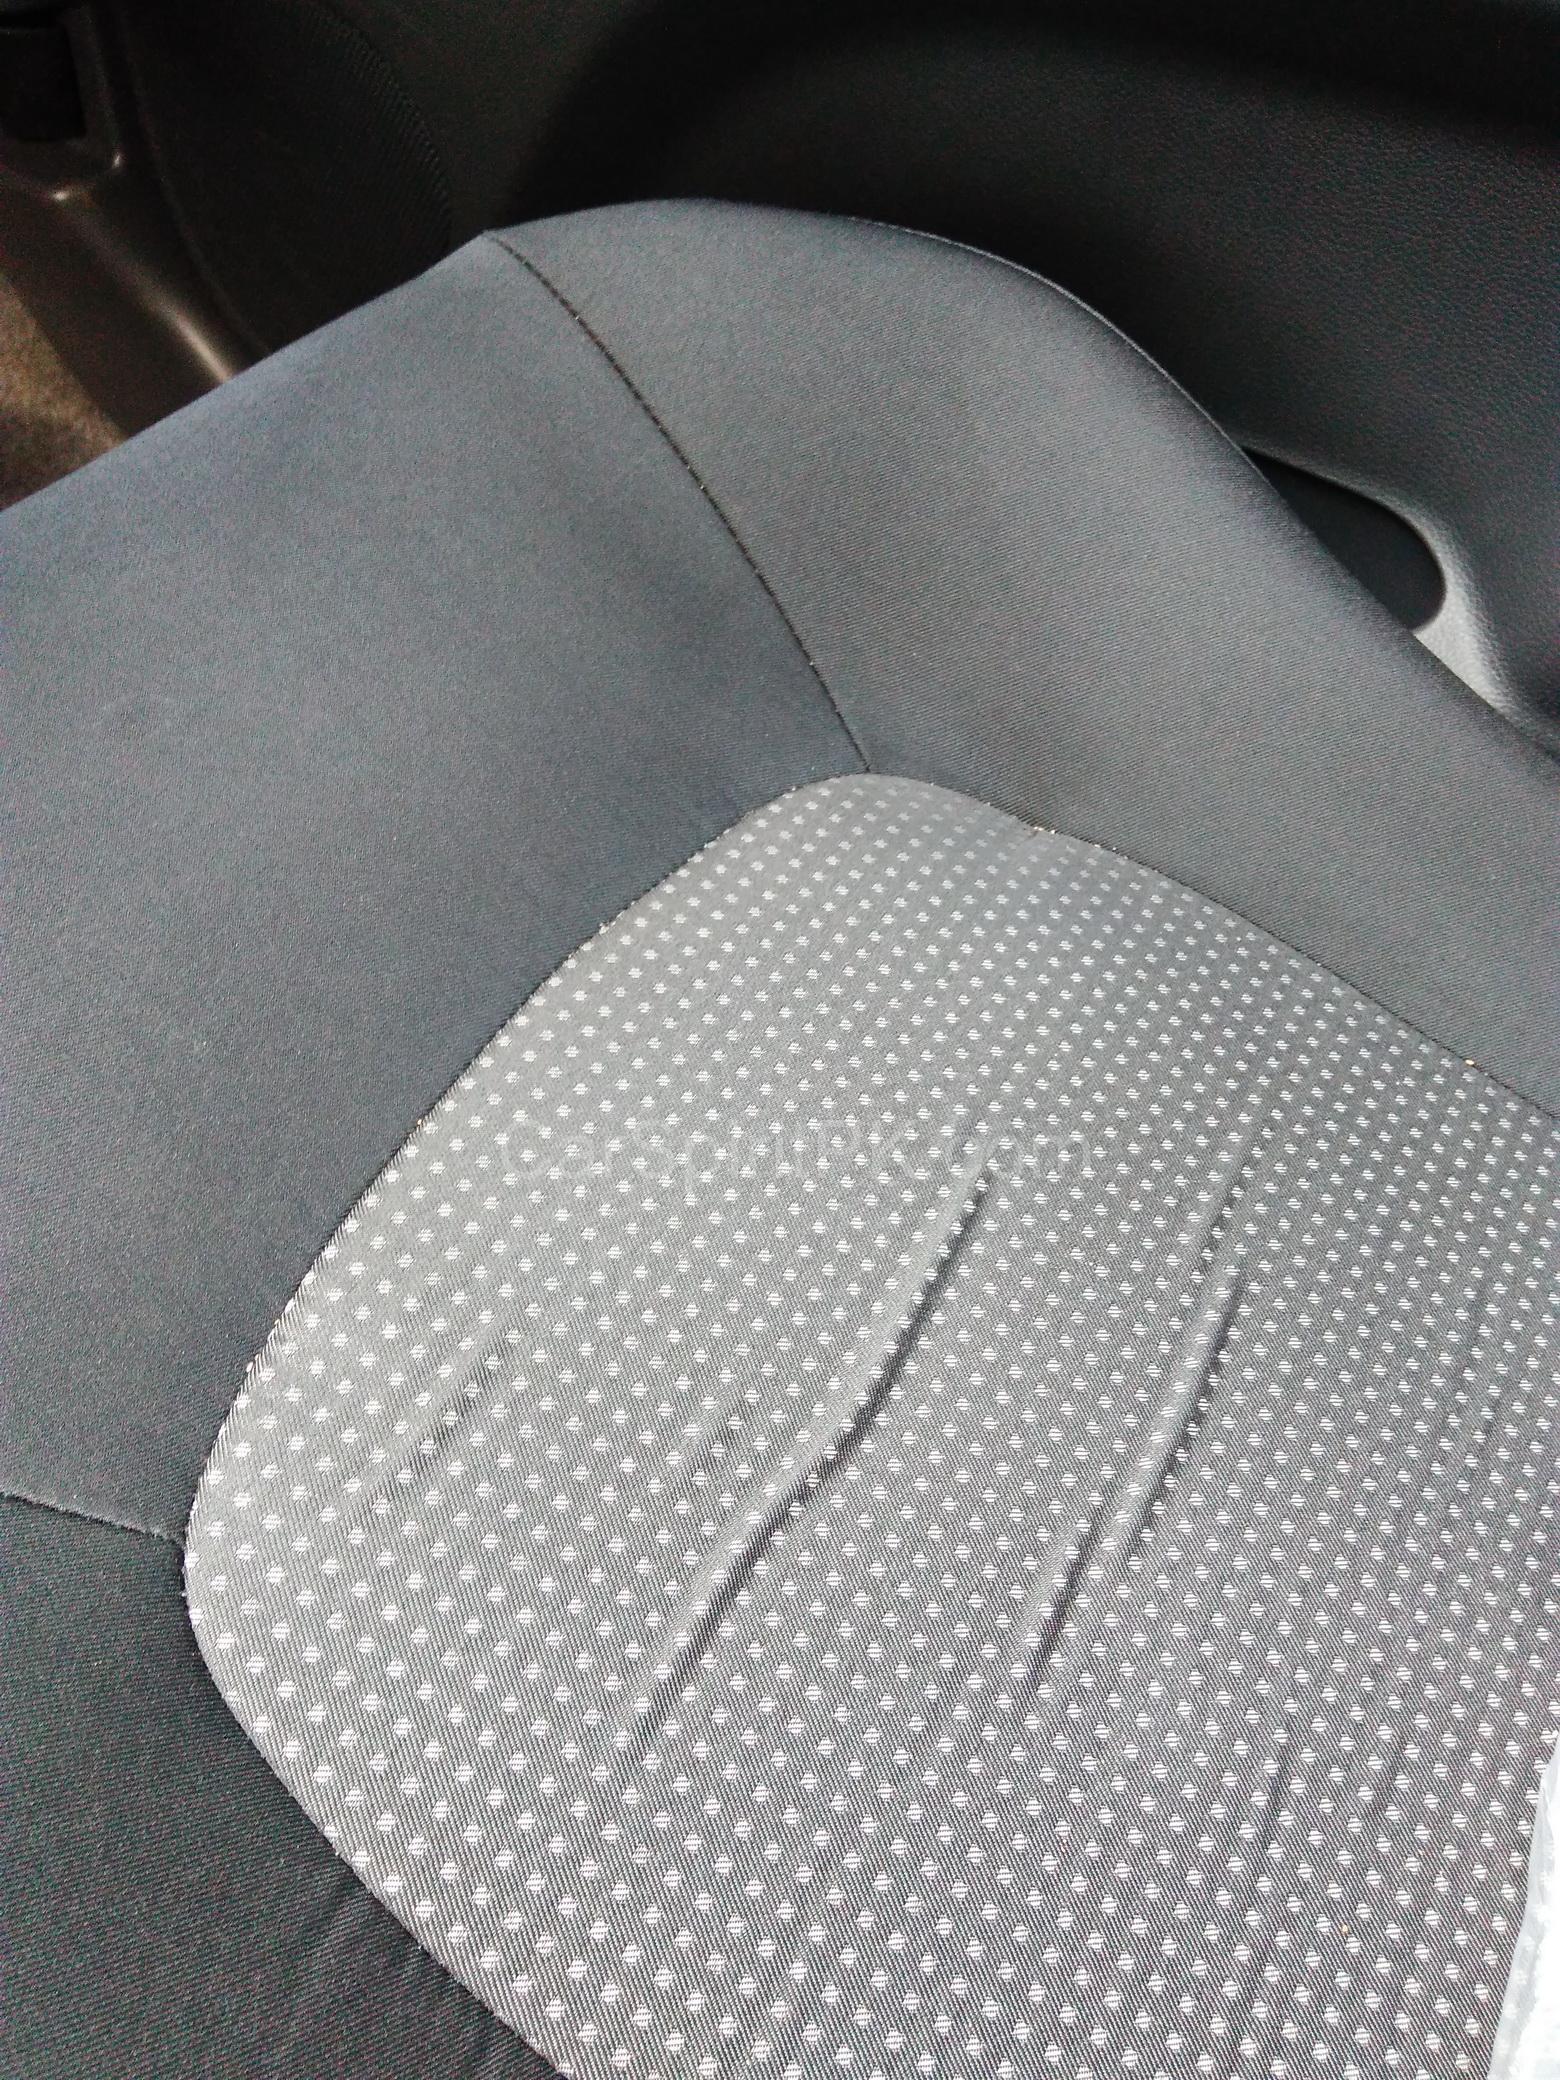 Review: 2017 Suzuki Cultus VXL 18